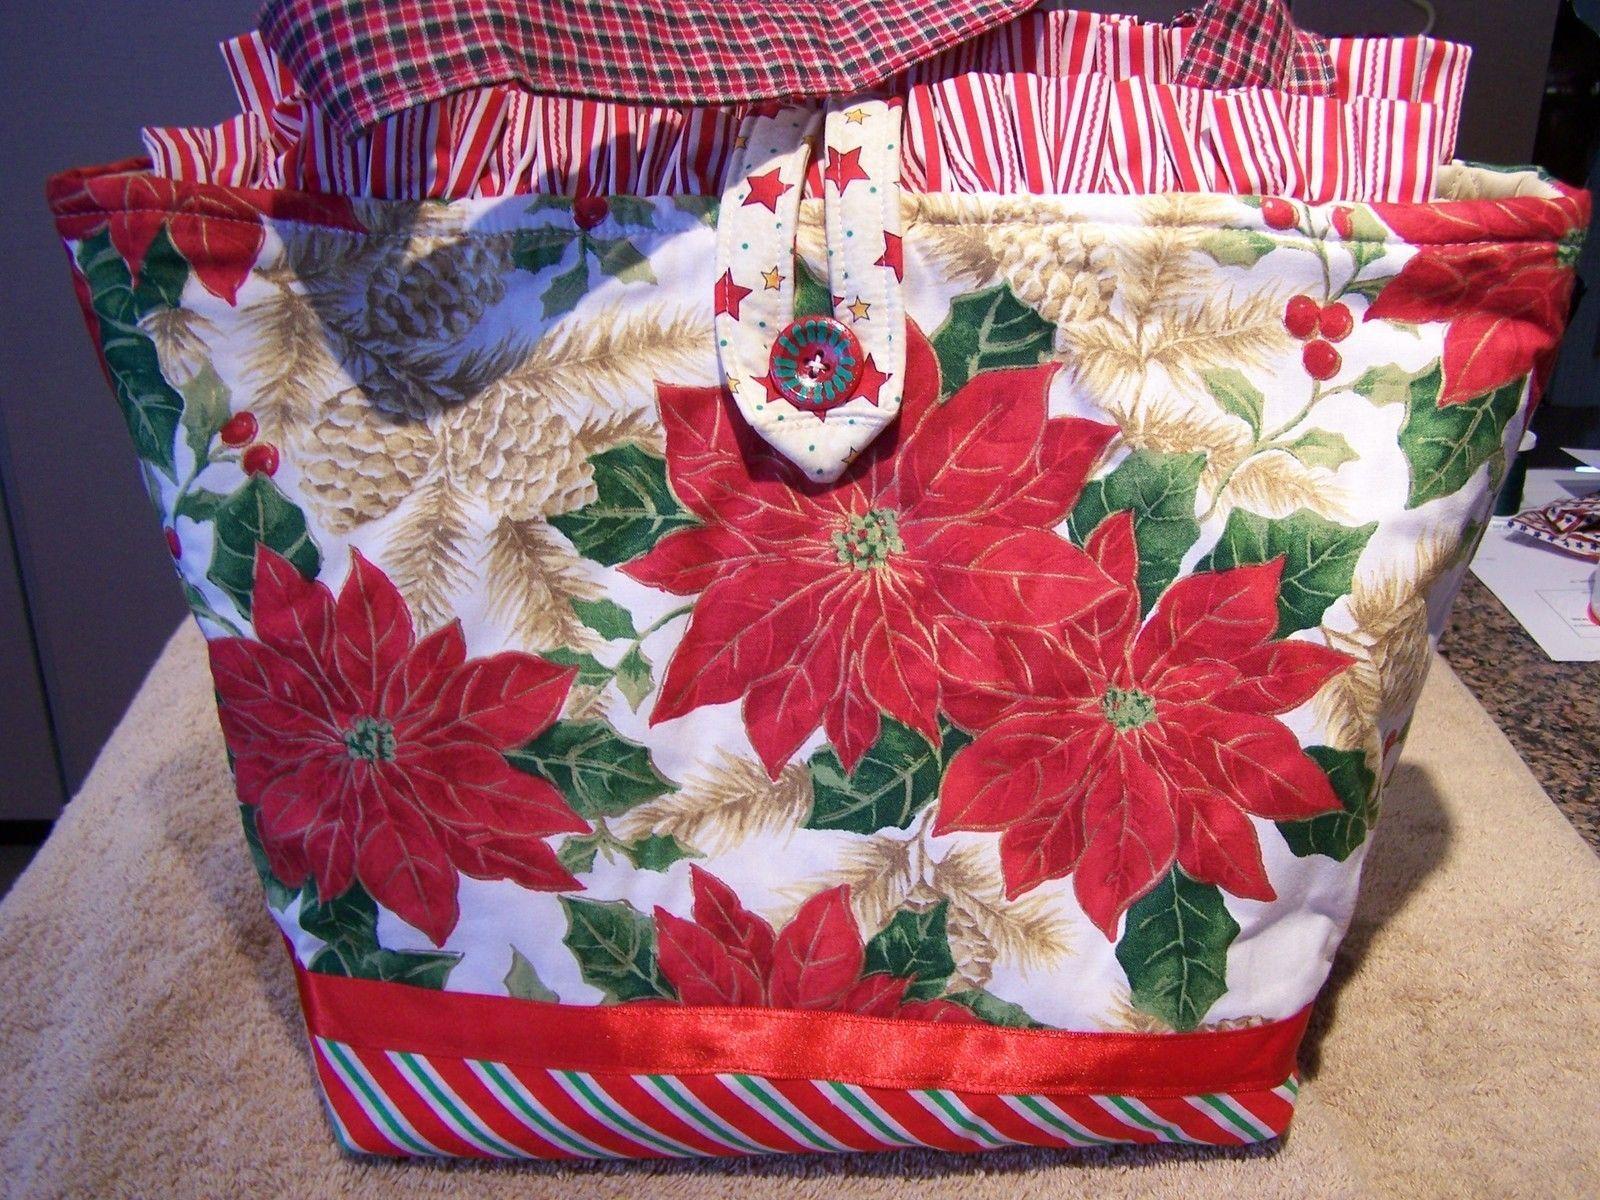 Christmas Poinsettias Red Quilted Handbag Tote Bag | eBay